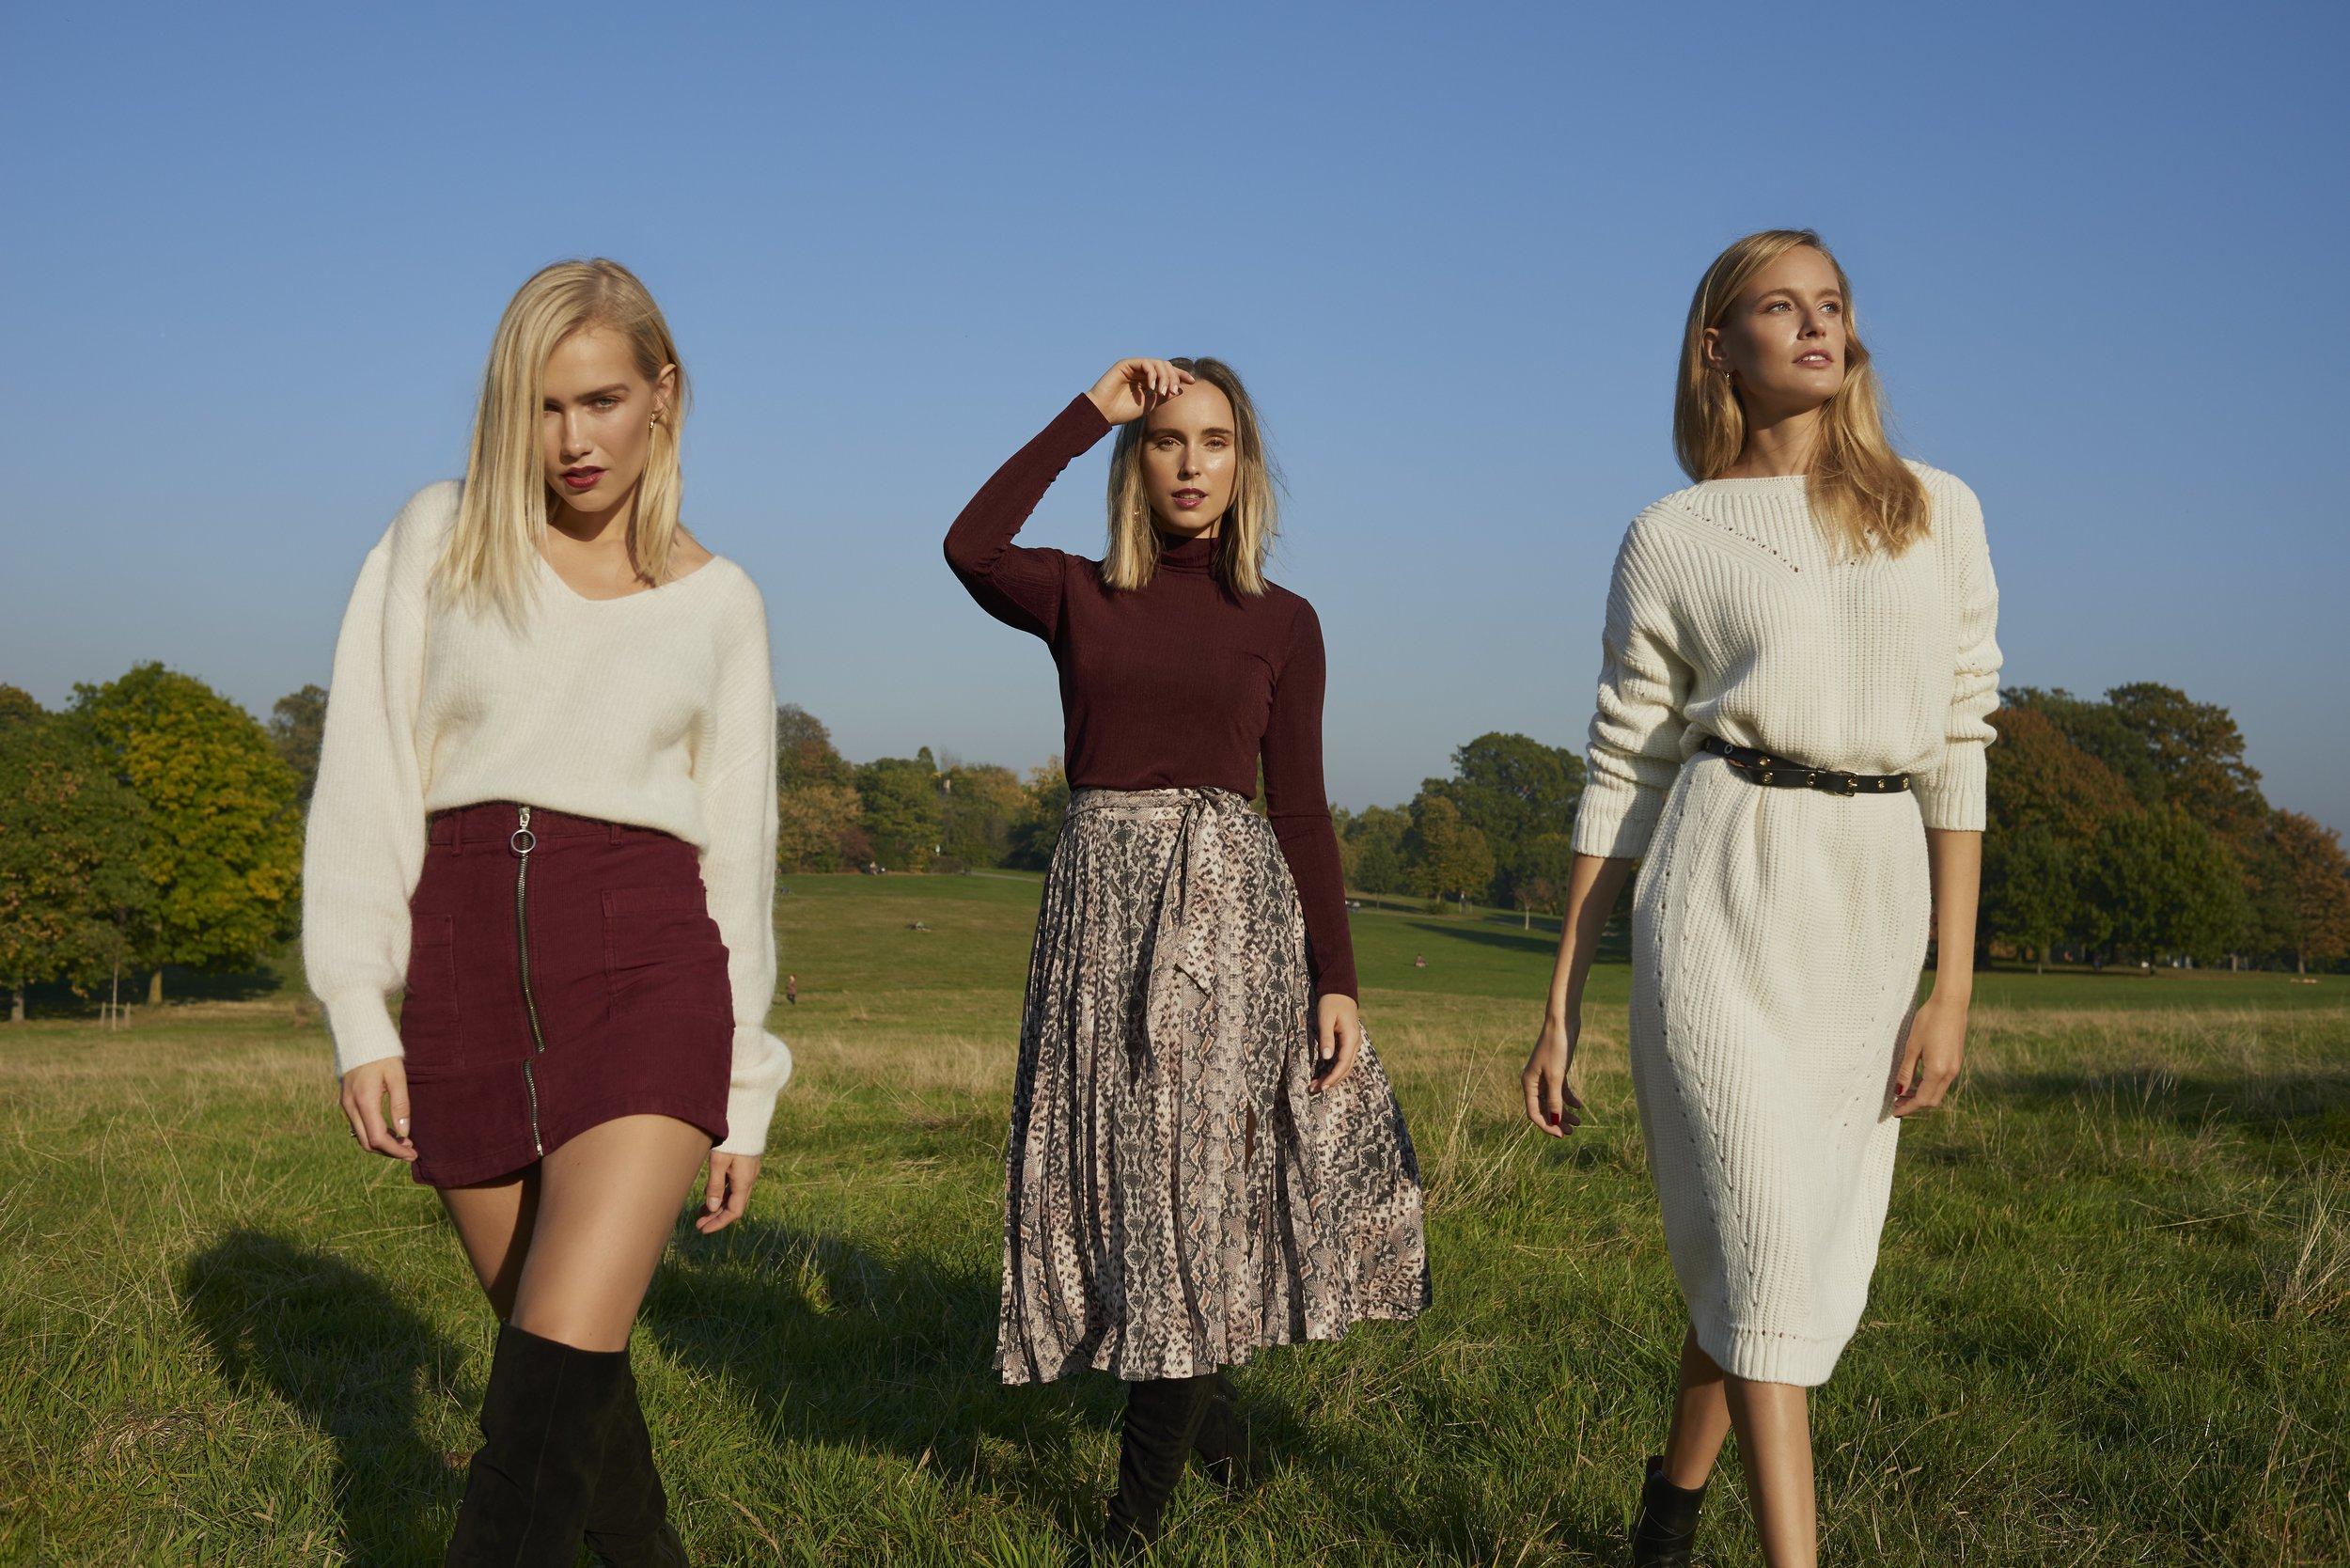 THE 4 OF US by   Eva Schwank